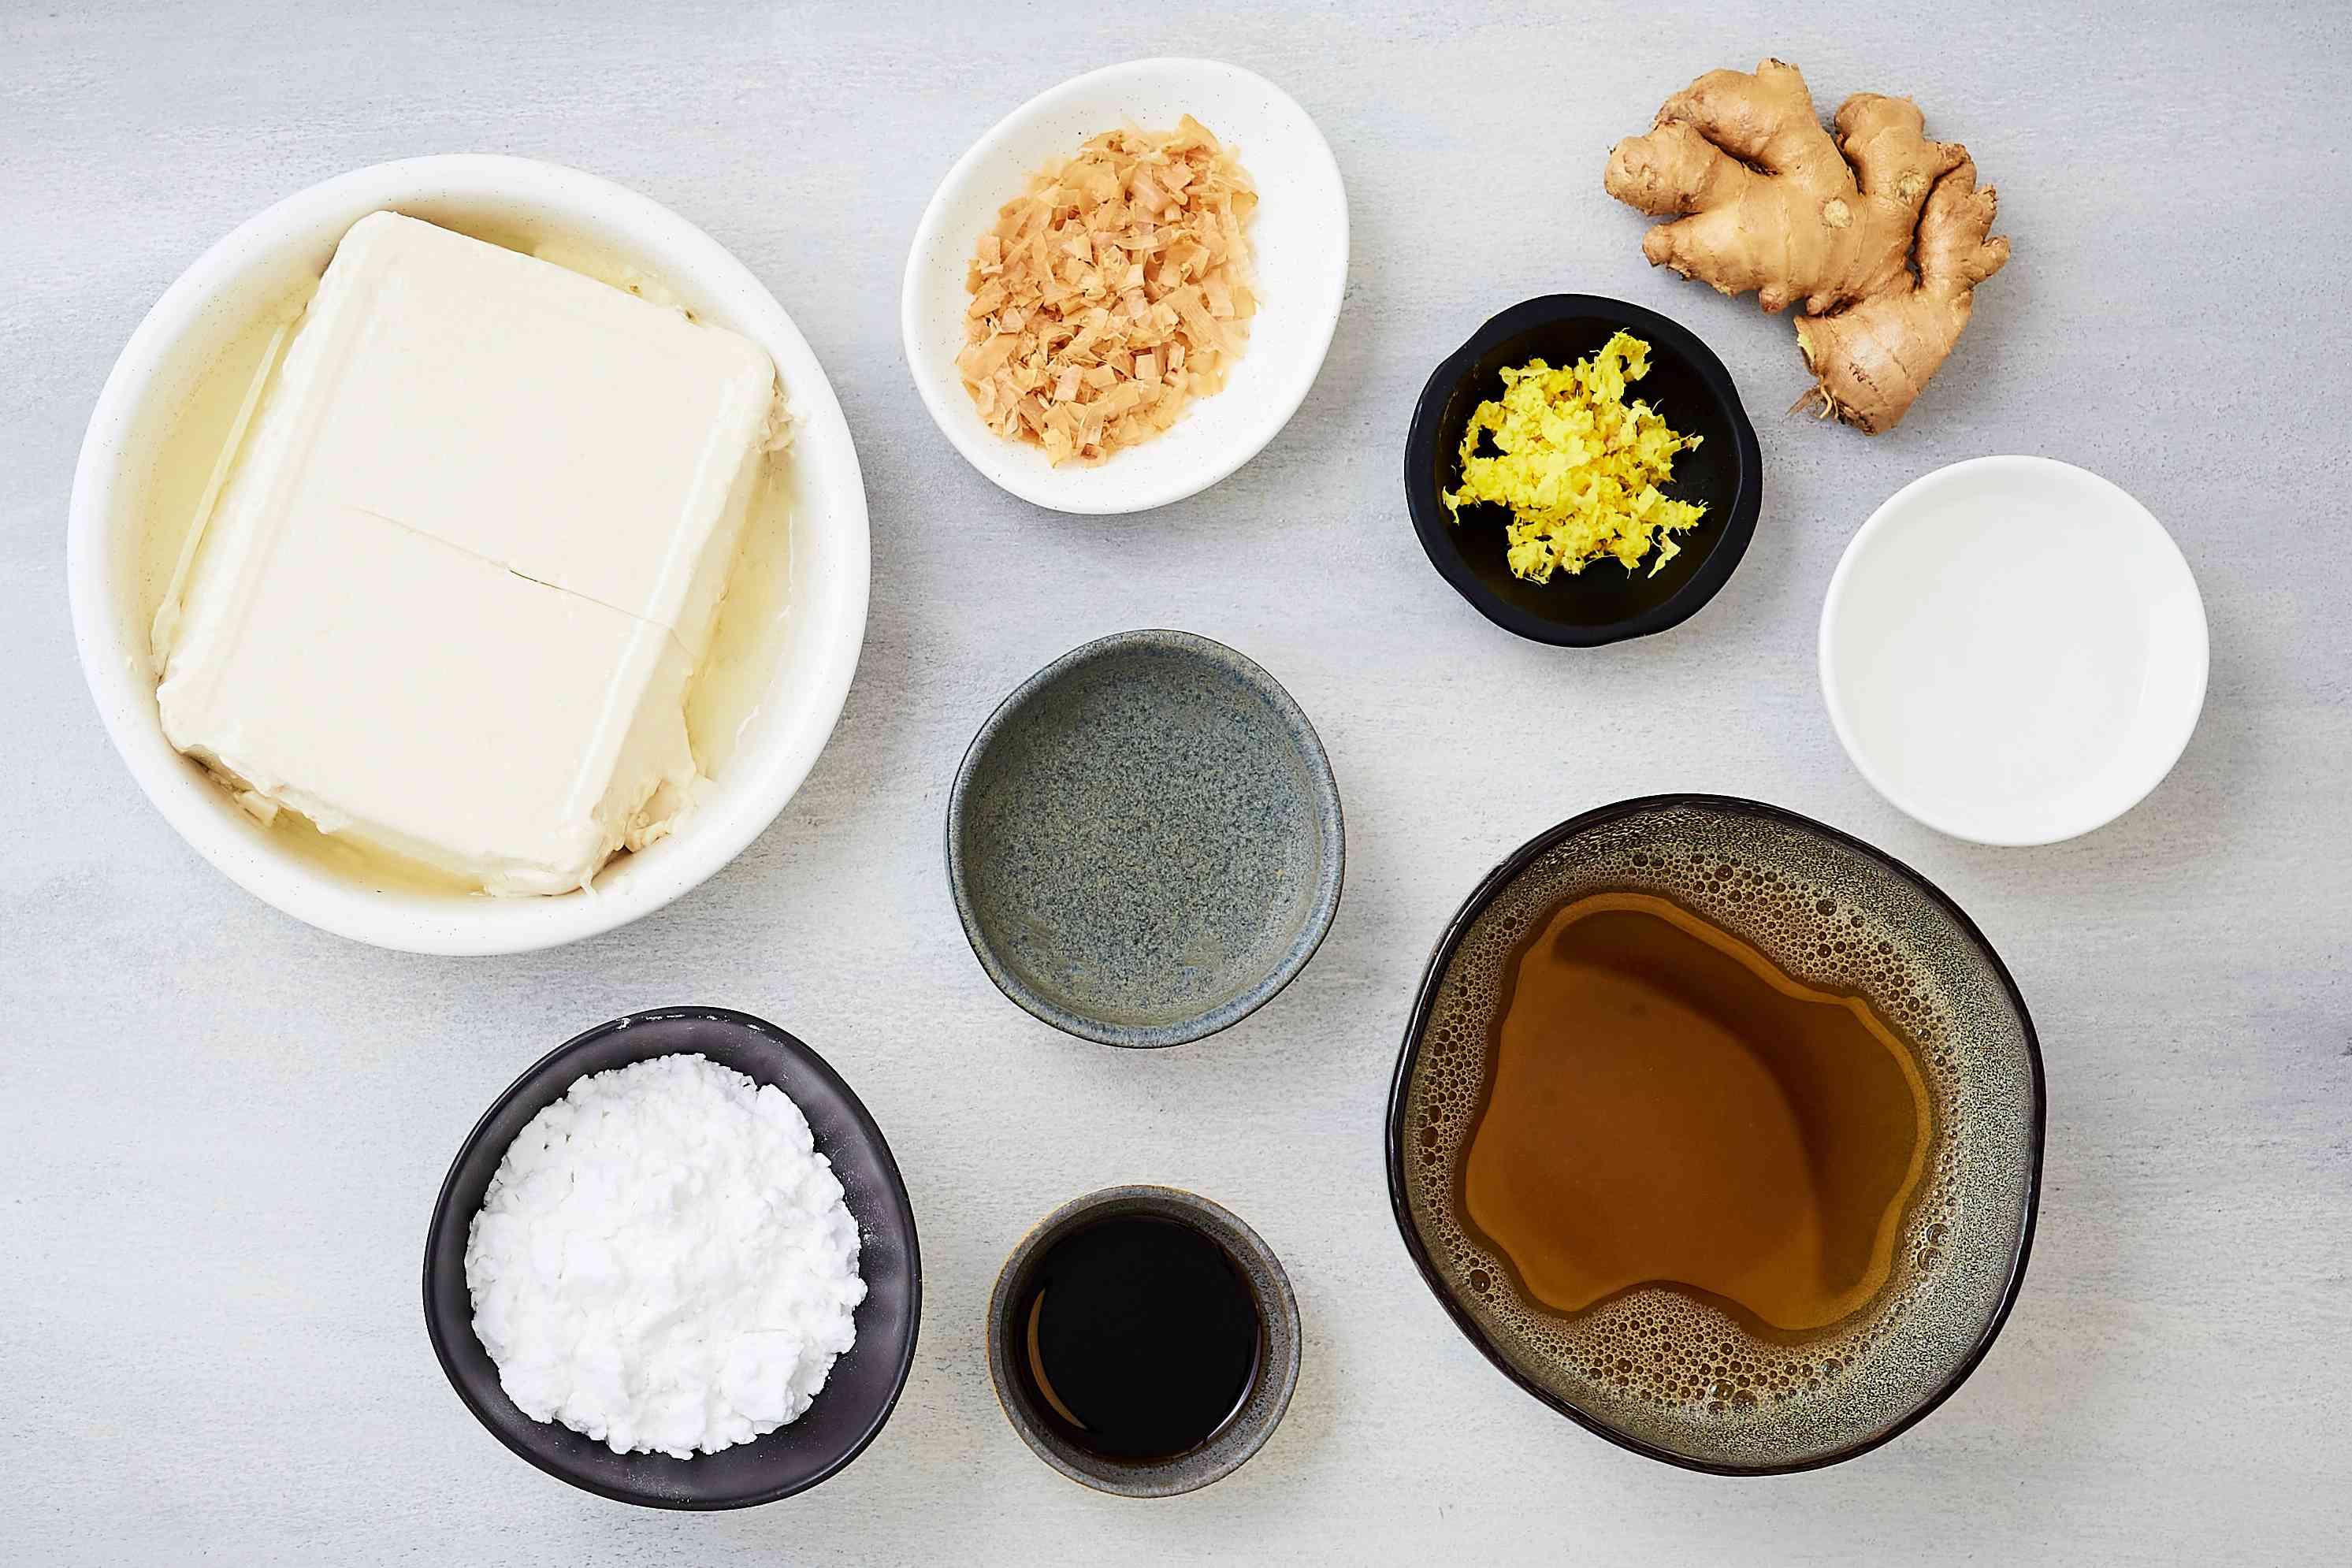 Agedashi Dofu: Japanese Fried Tofu in a Dashi-Based Sauce ingredients